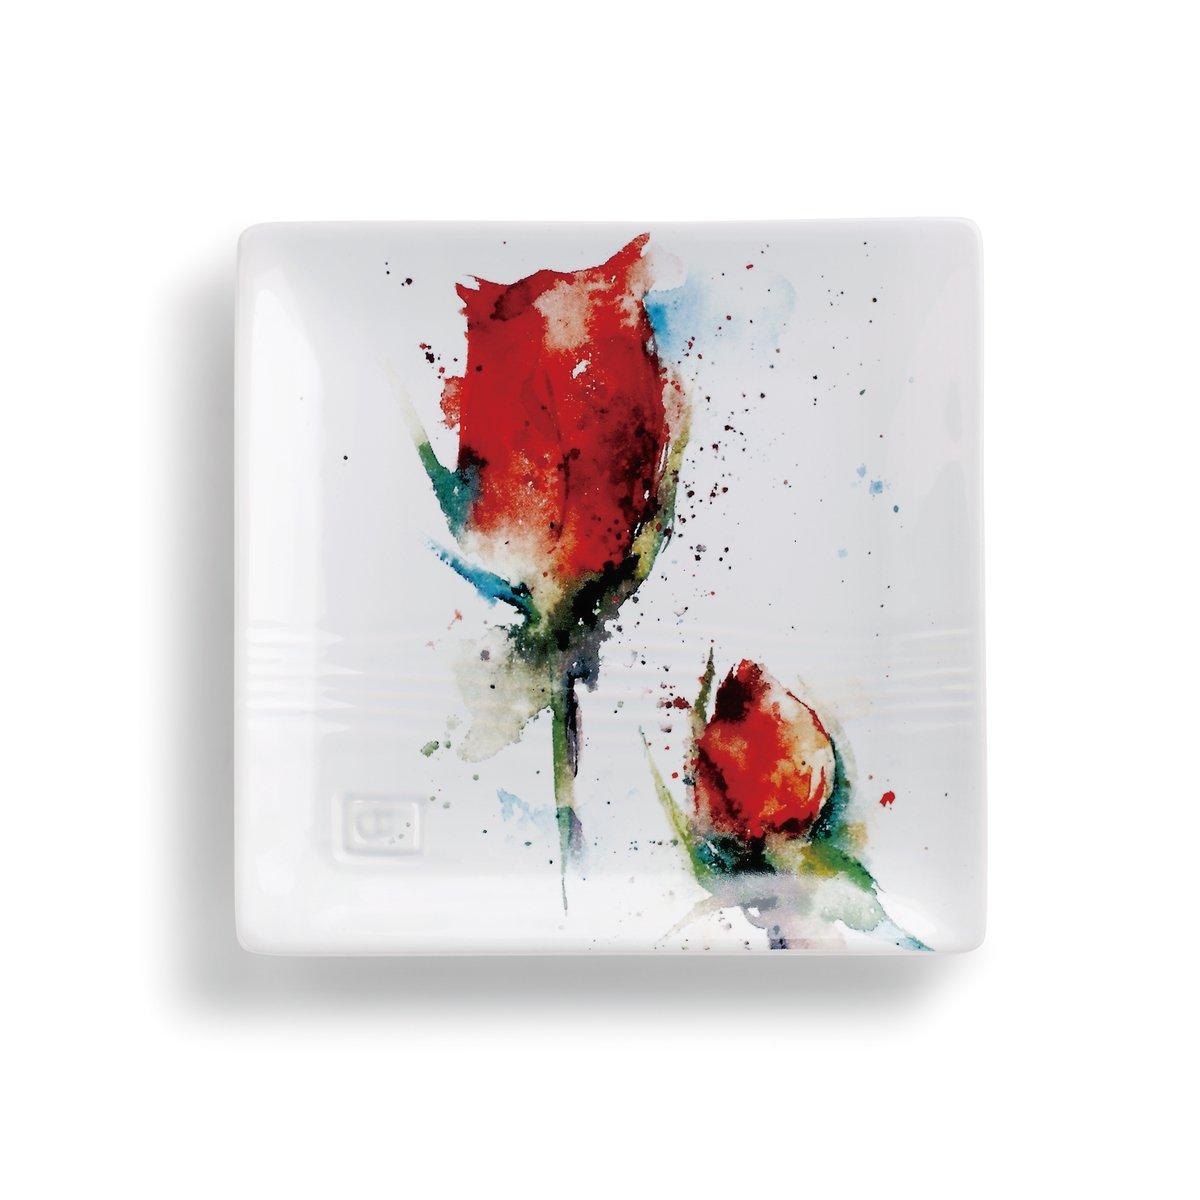 Demdaco 3005051276 Big Sky Carvers Red Rose Snack Plate, Multicolor